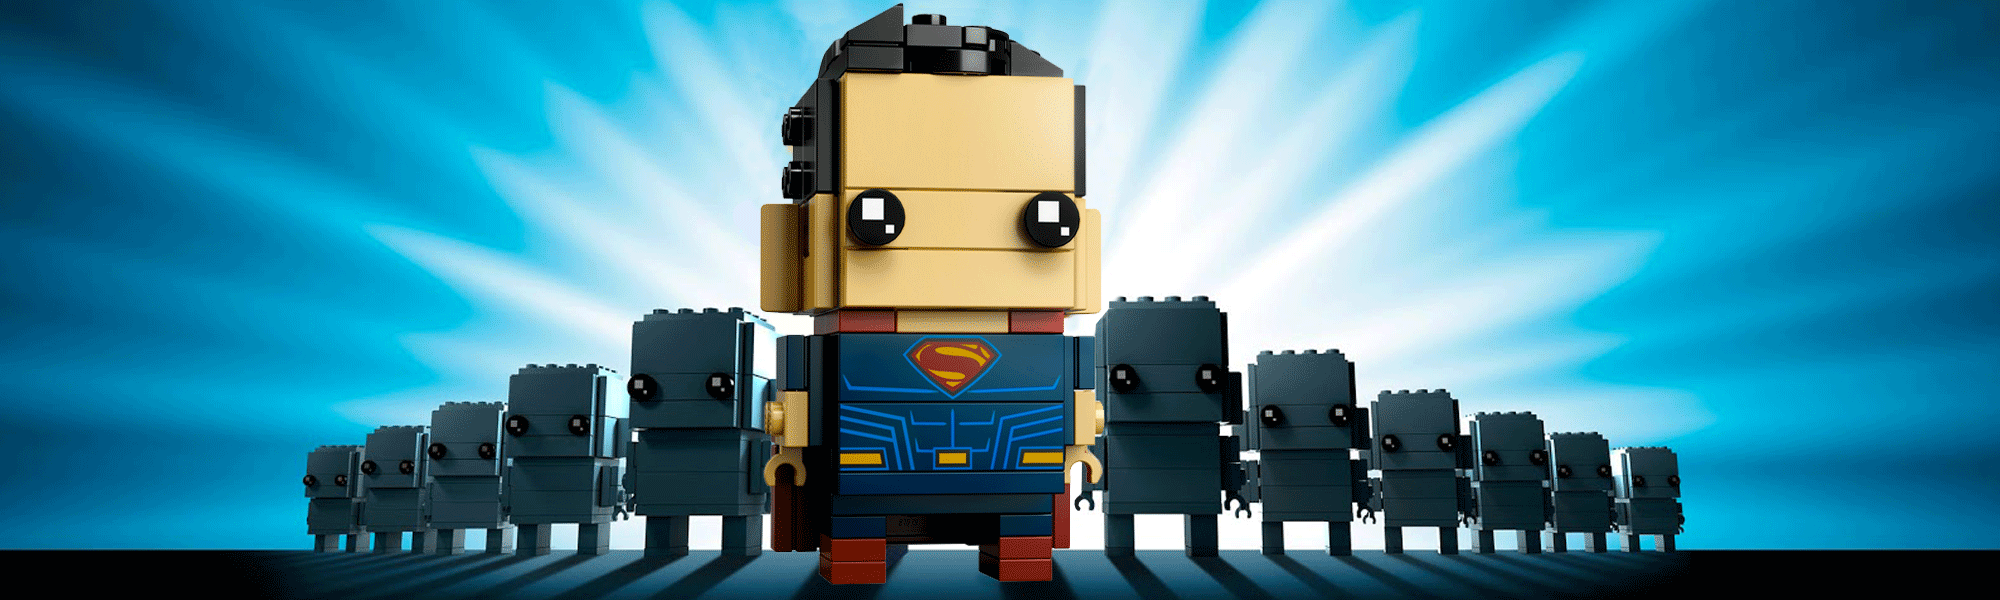 LEGO POP CULTURE CONSTRUCTION